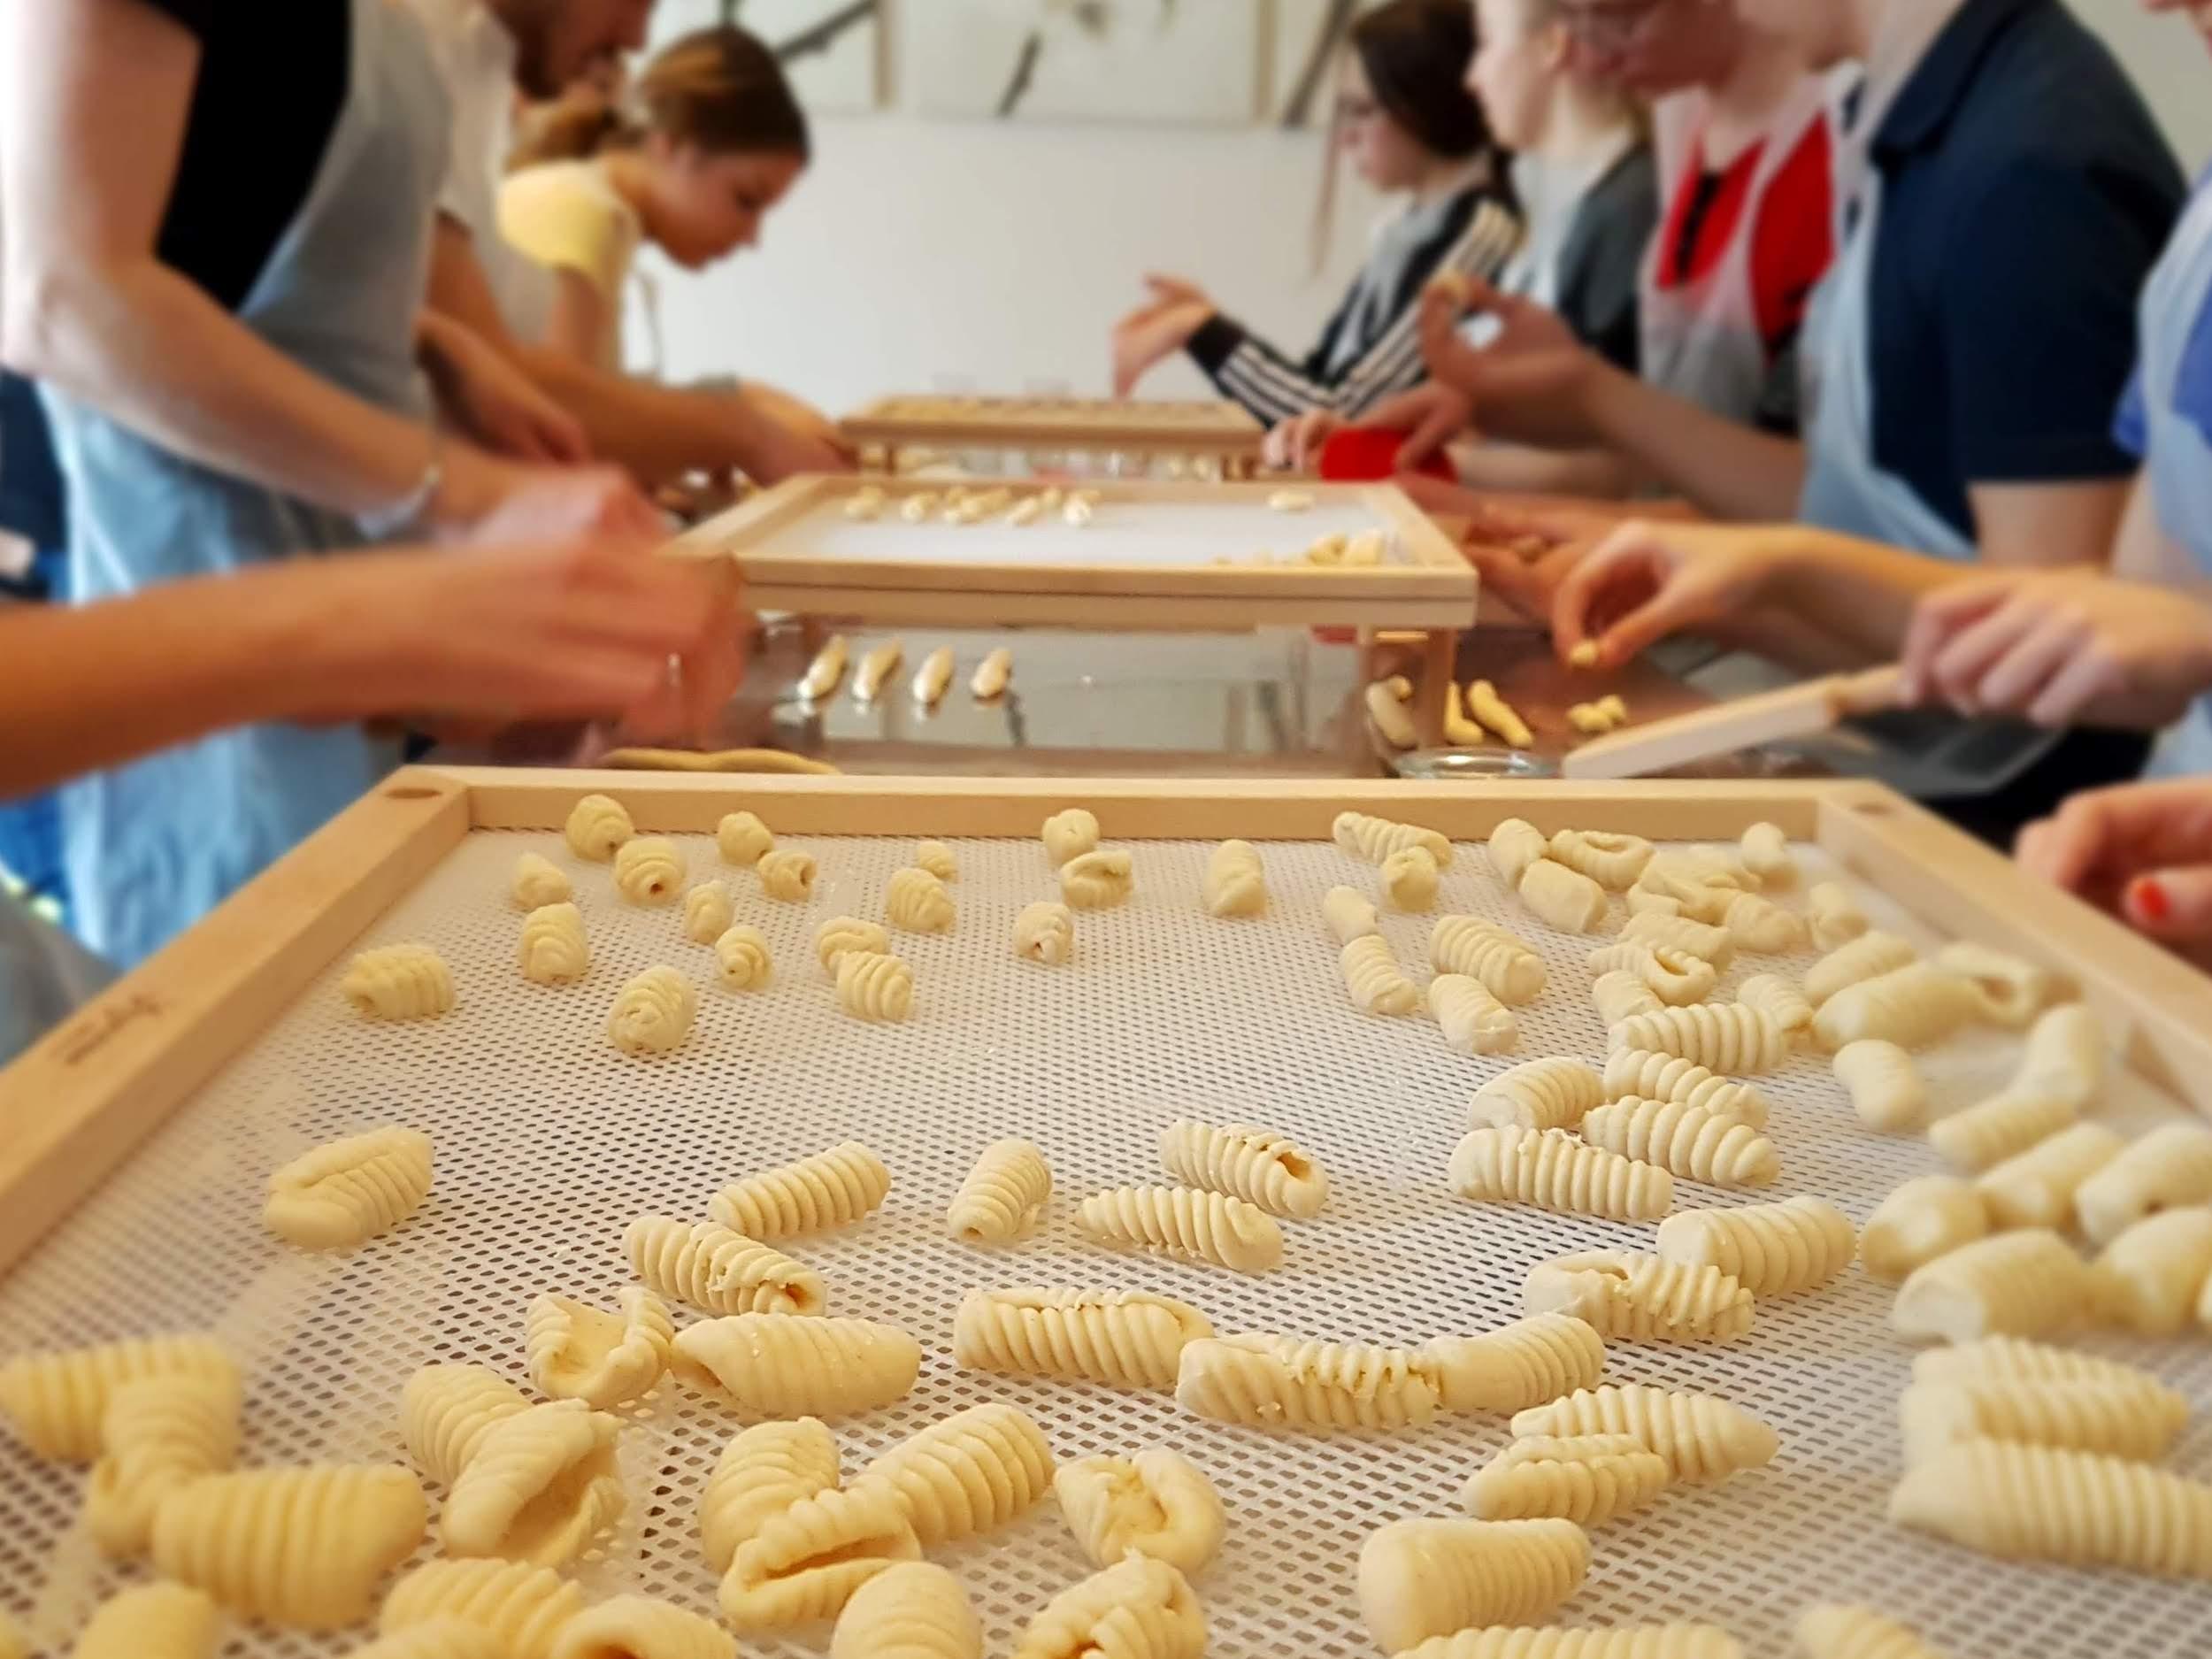 Gnocchi on a drying board